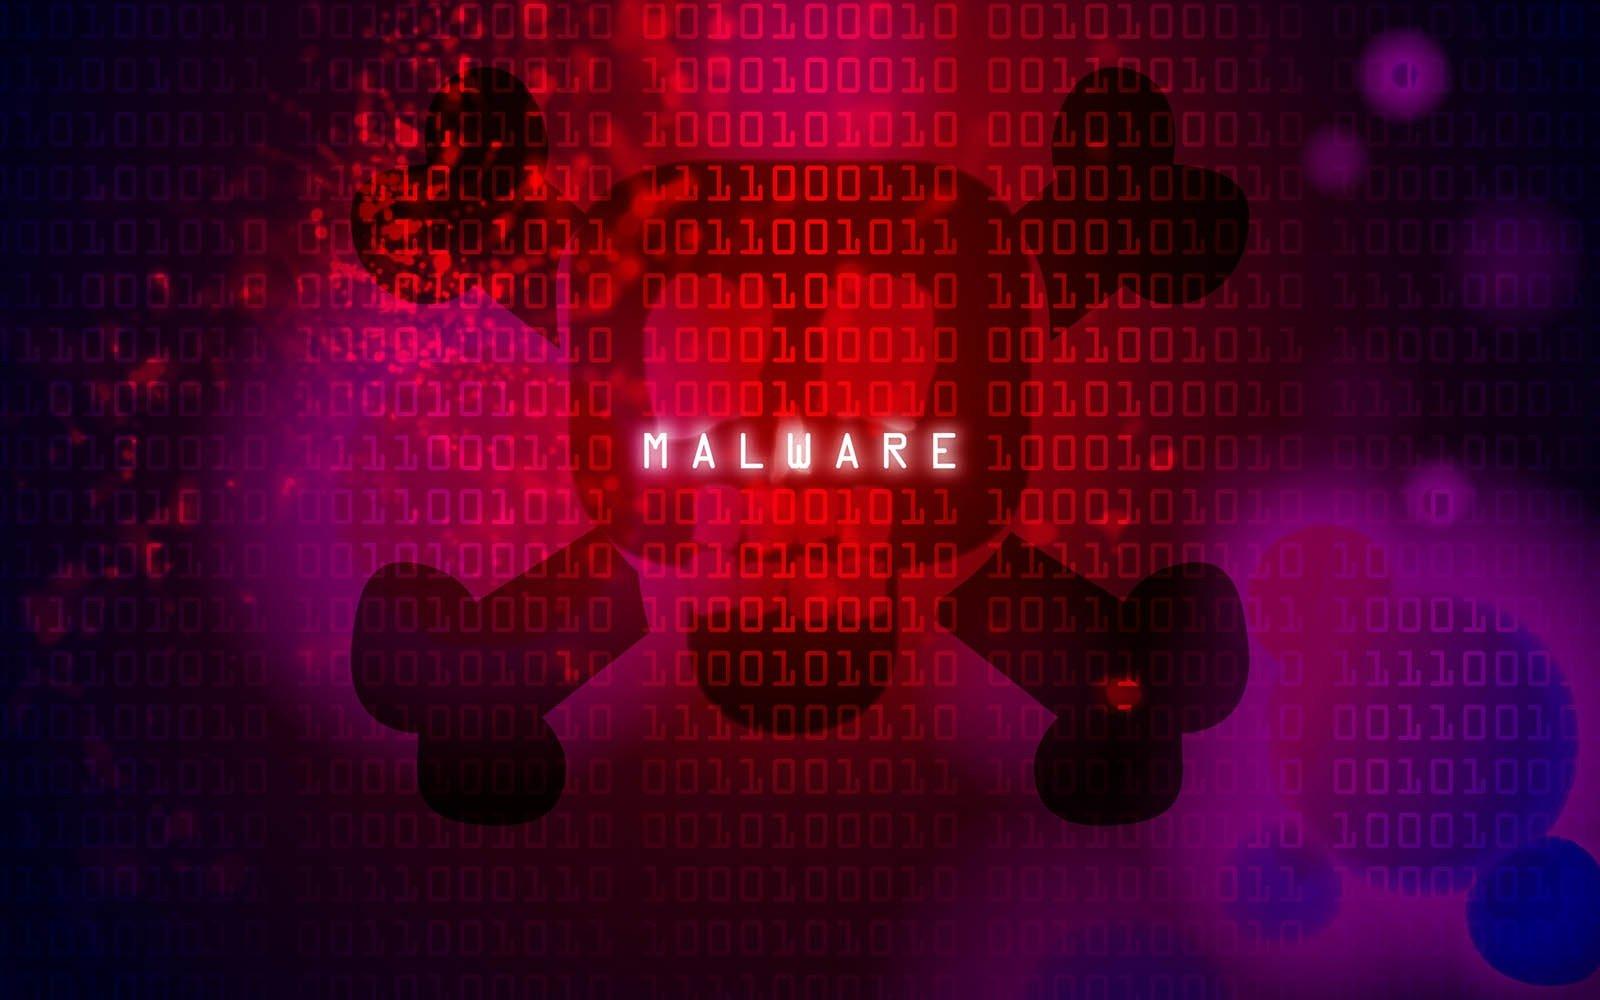 malware internet